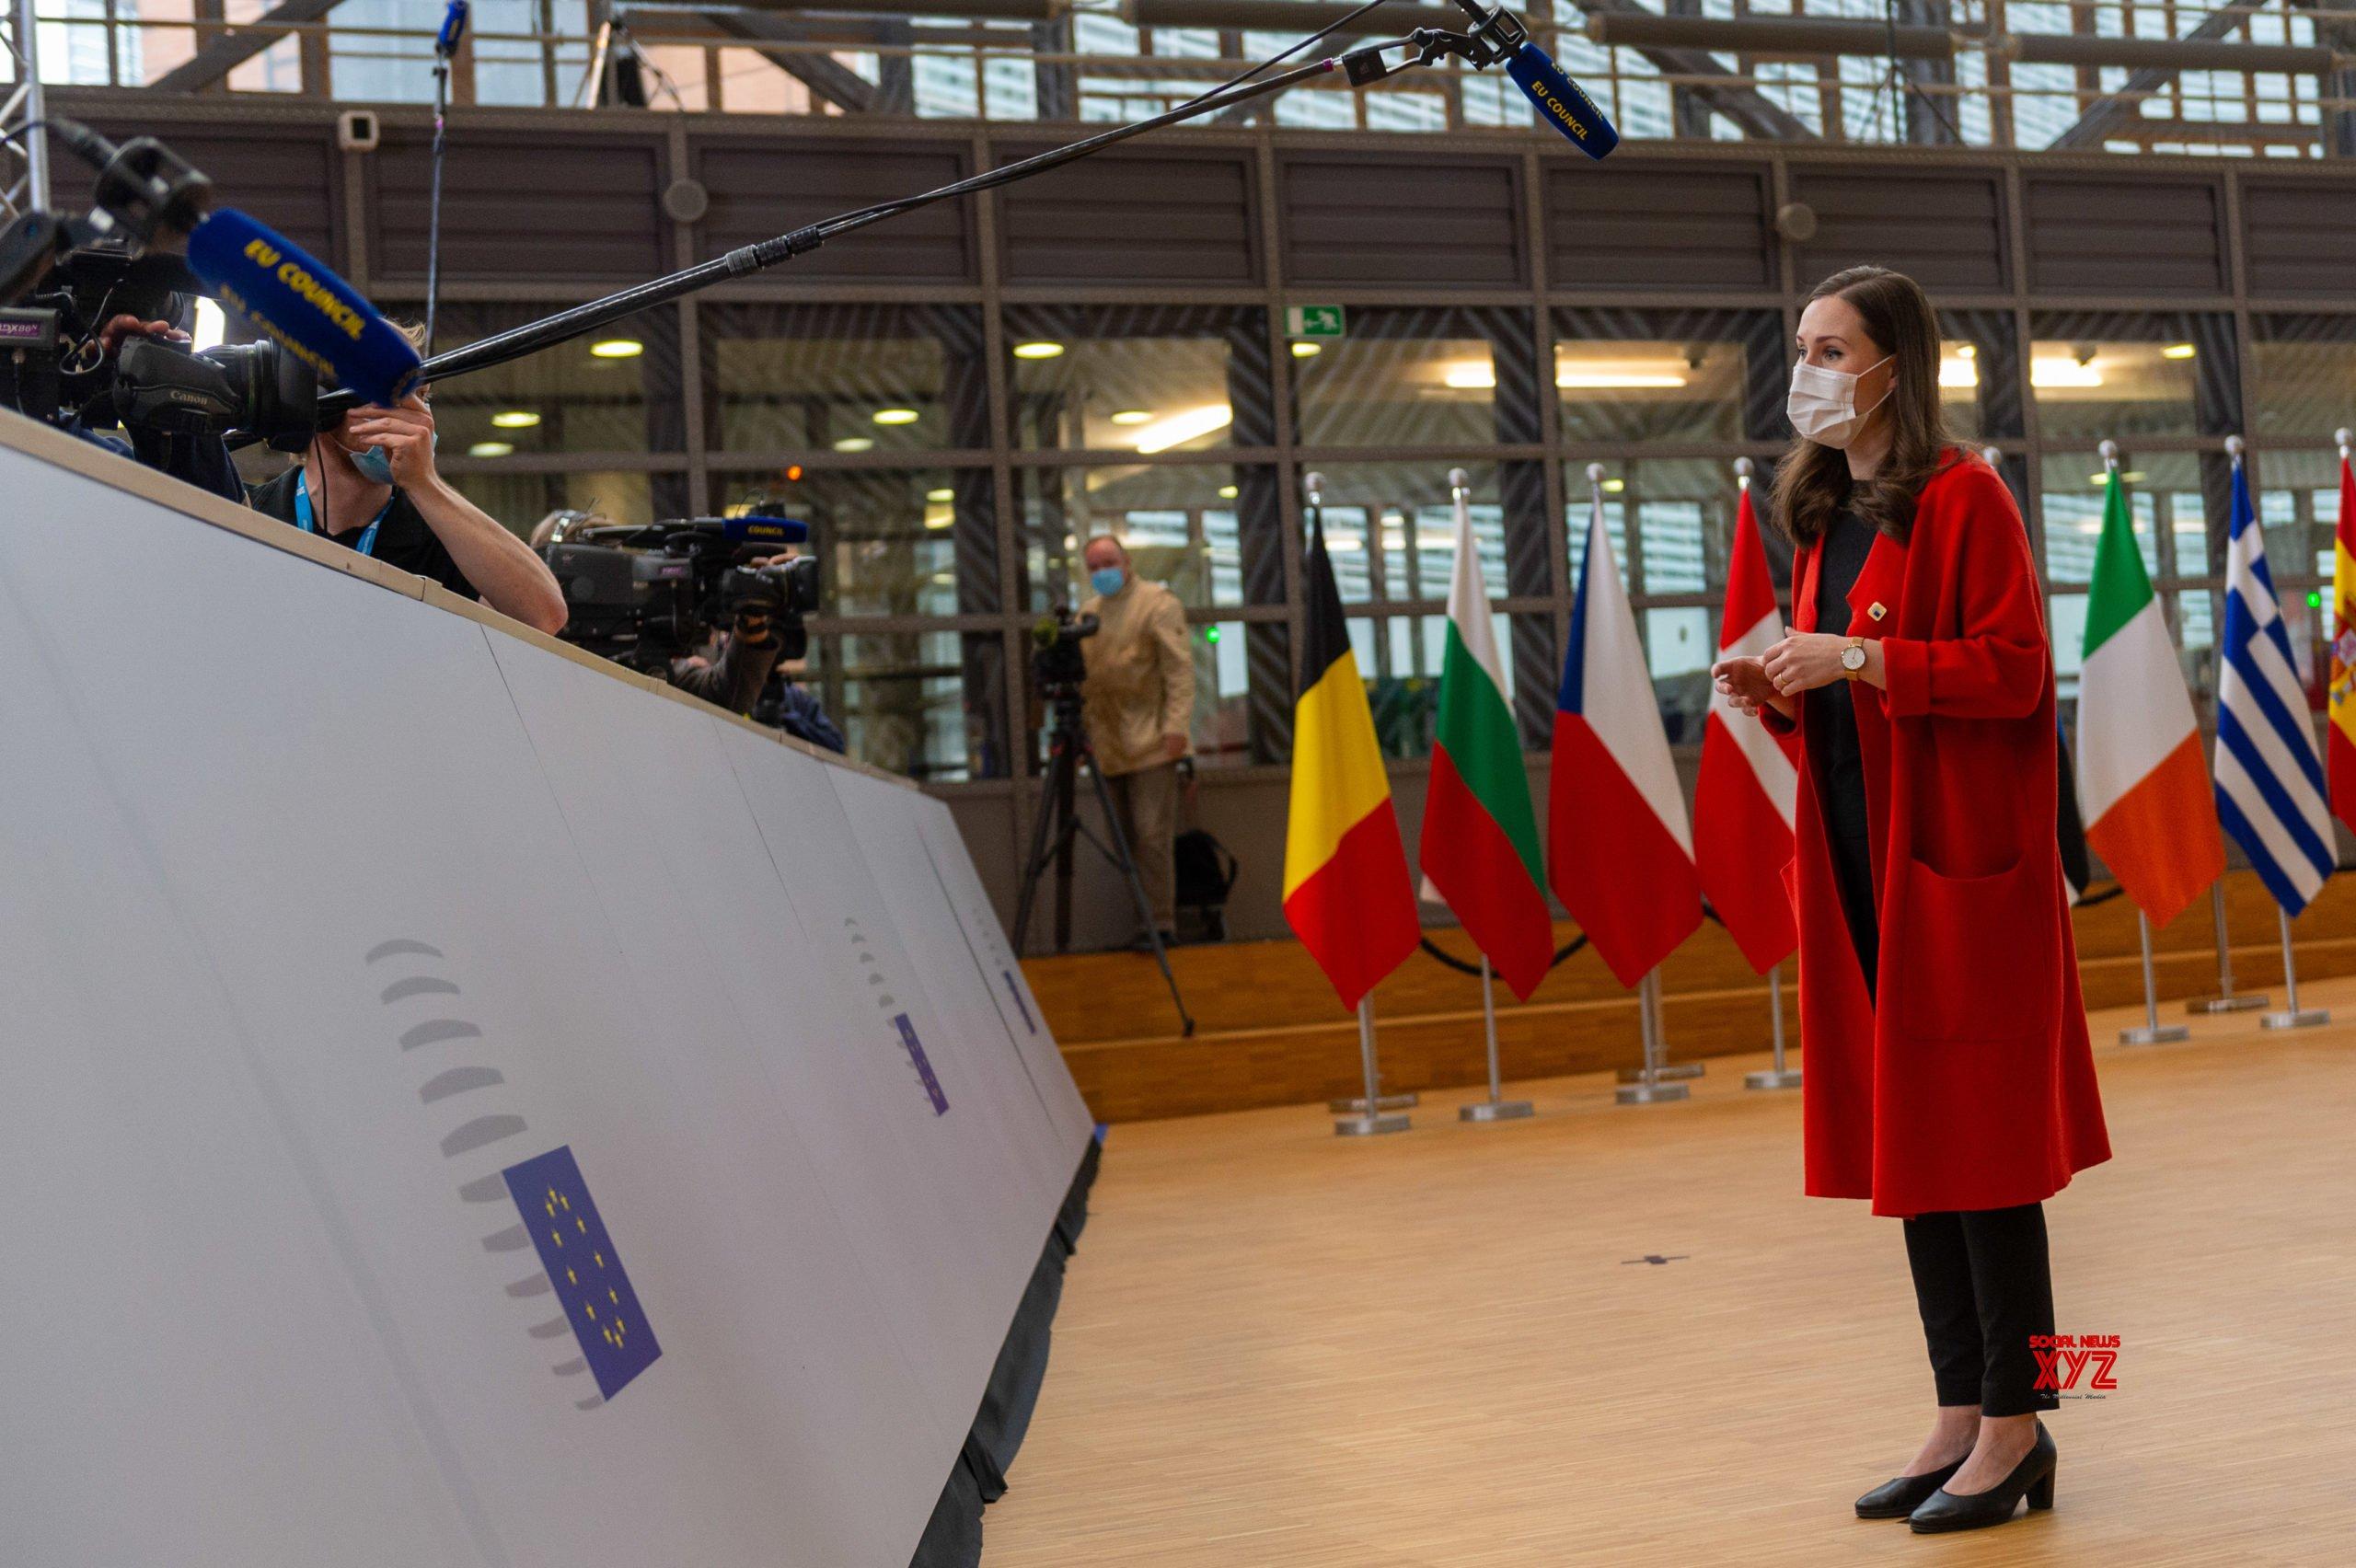 BELGIUM - BRUSSELS - EU - SUMMIT #Gallery